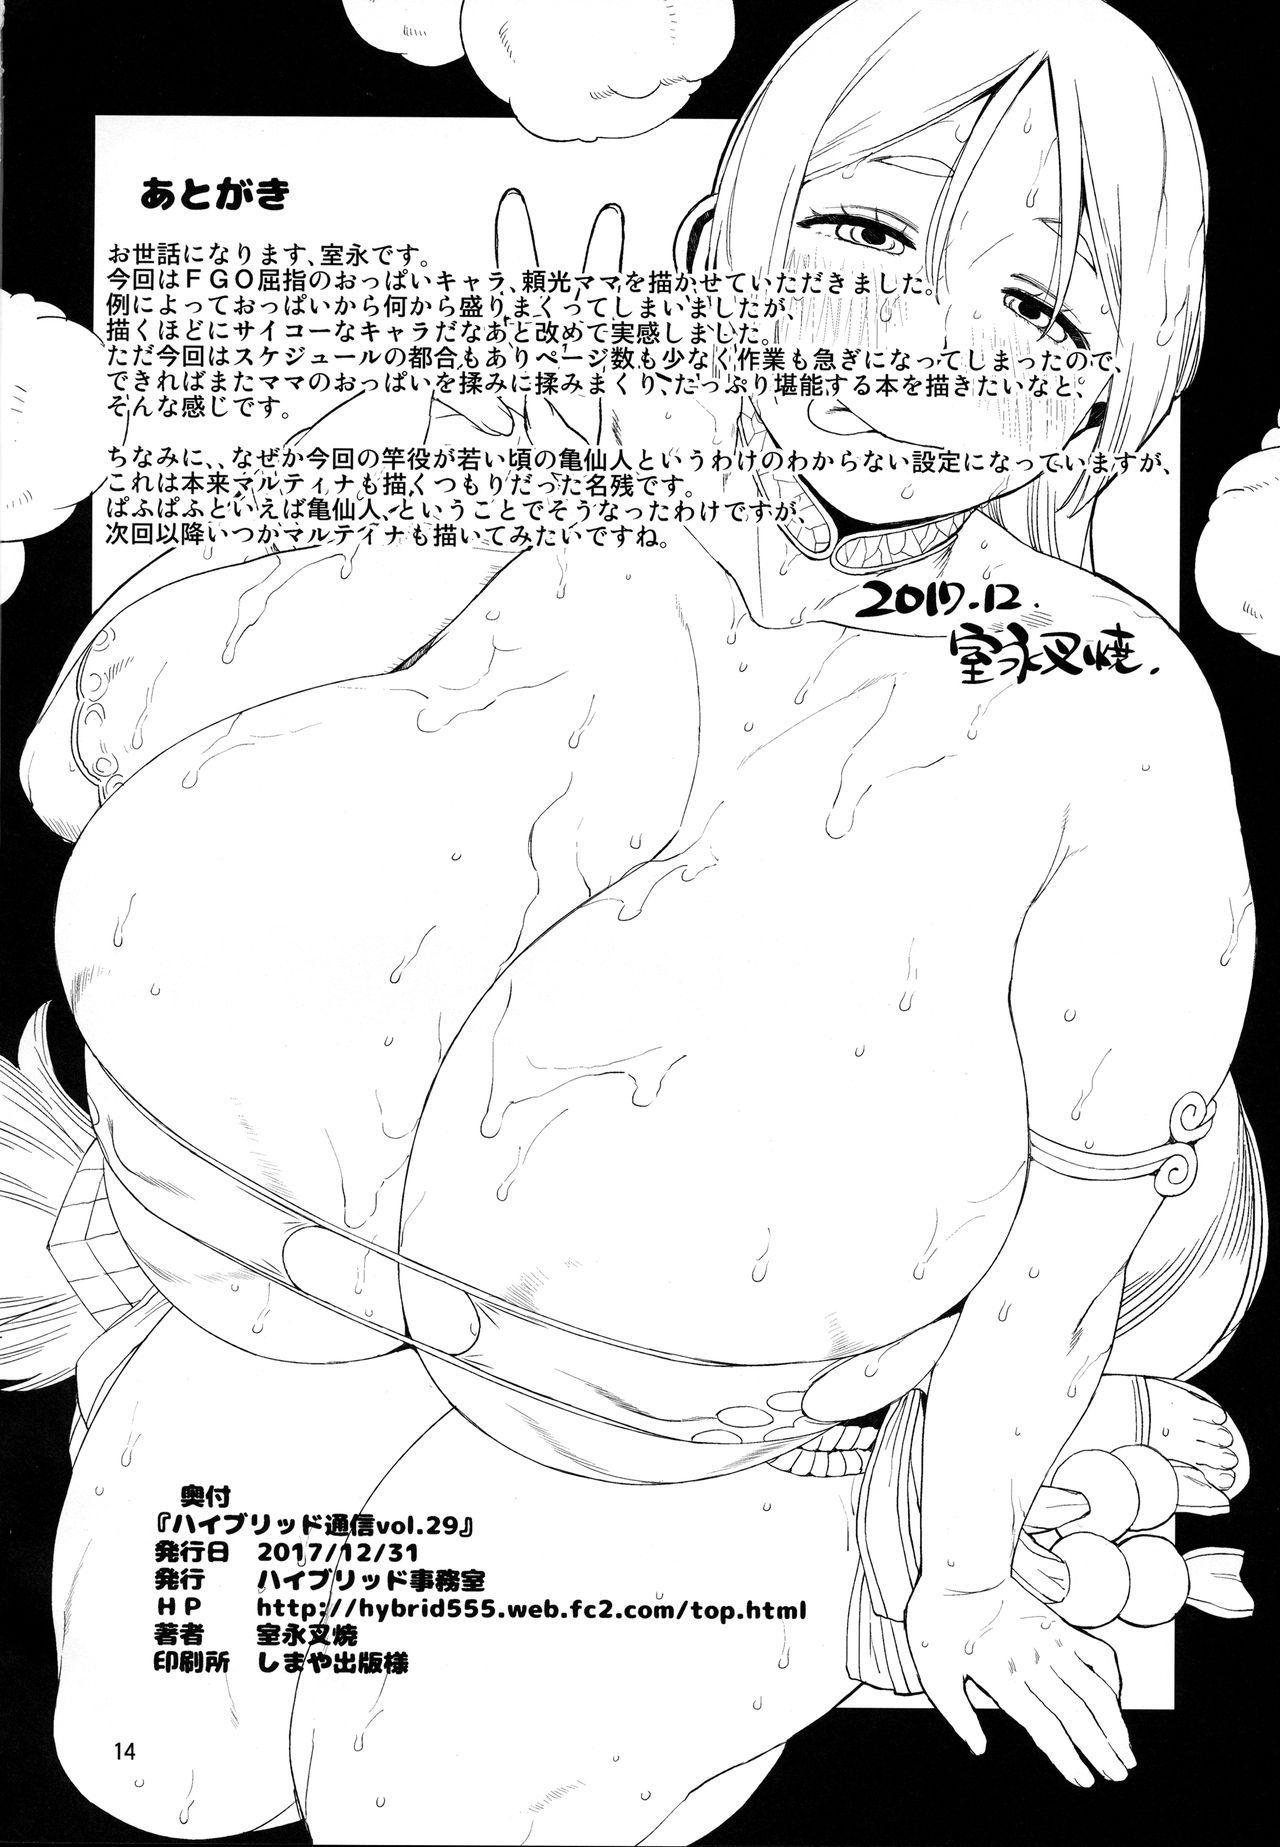 Hybrid Tsuushin vol. 29 12